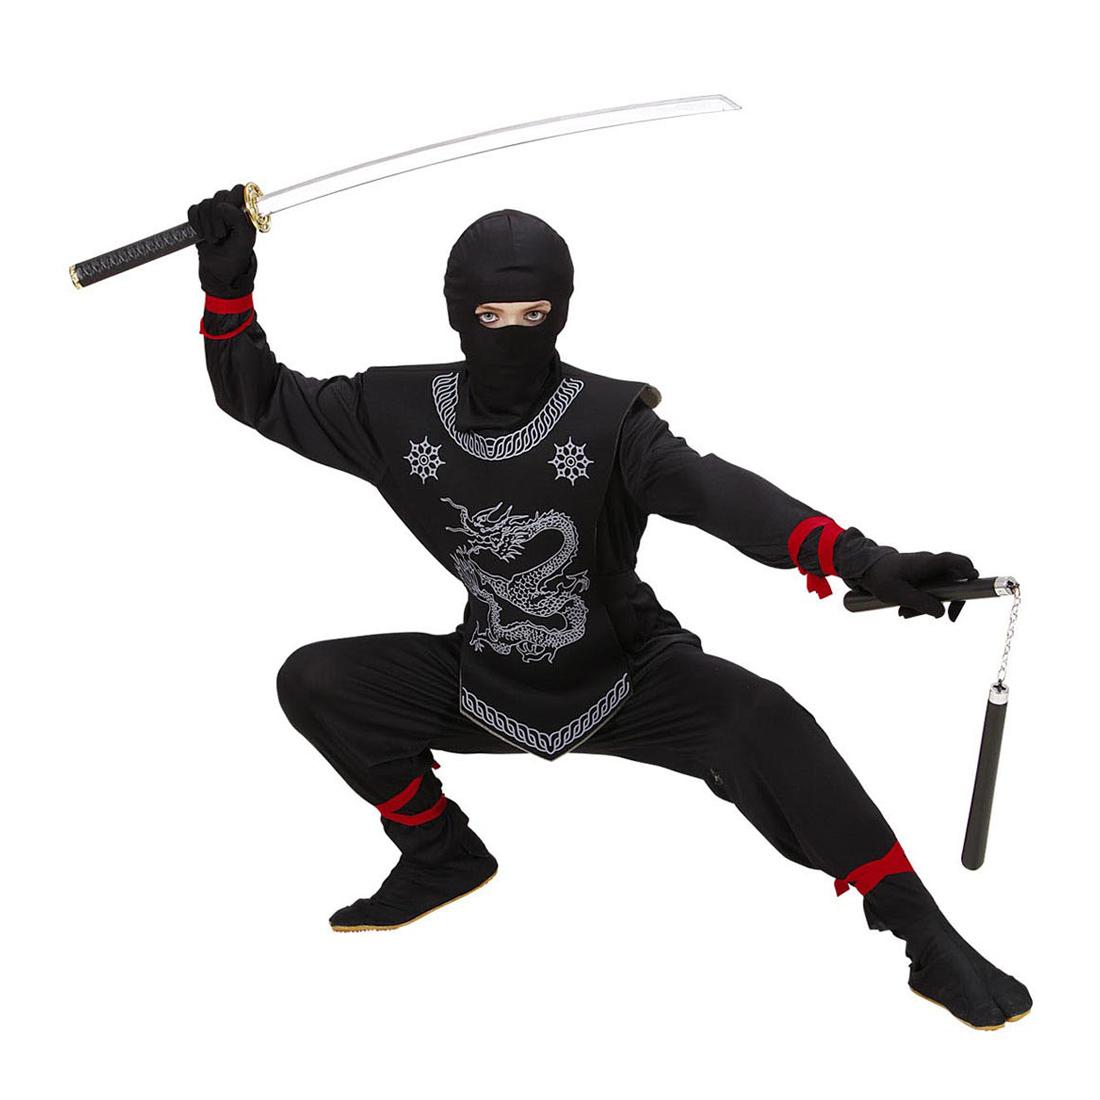 schwarzer ninja kost m kinder ninjakost m samurai kinderkost m anzug k mpfer ebay. Black Bedroom Furniture Sets. Home Design Ideas